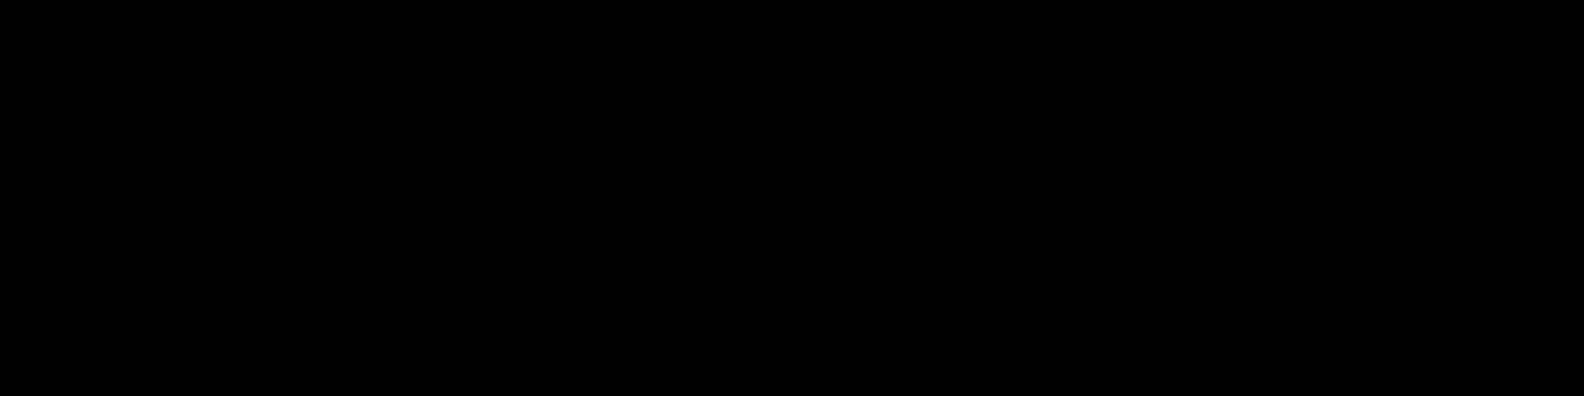 1584x396 Black Solid Color Background